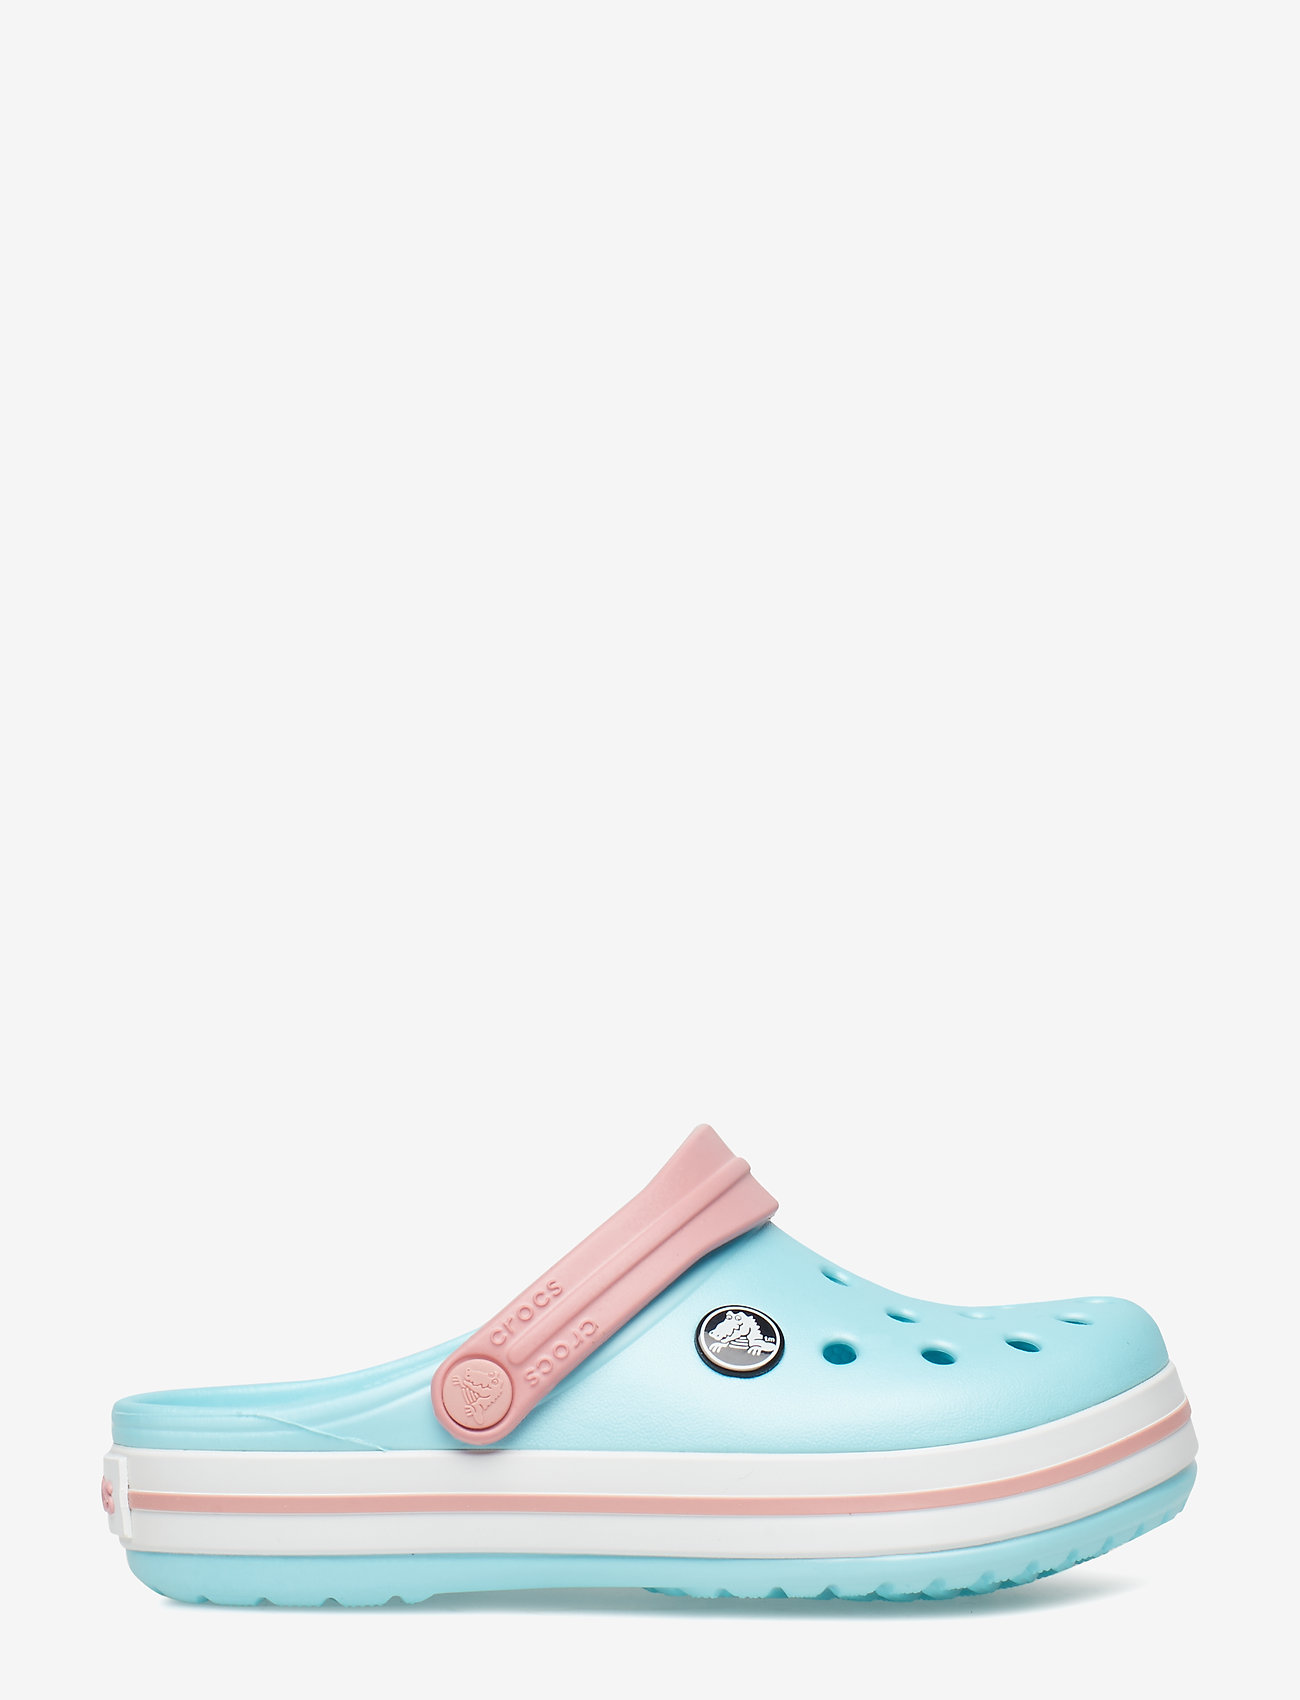 Crocs - Crocband Clog K - ice blue/white - 1